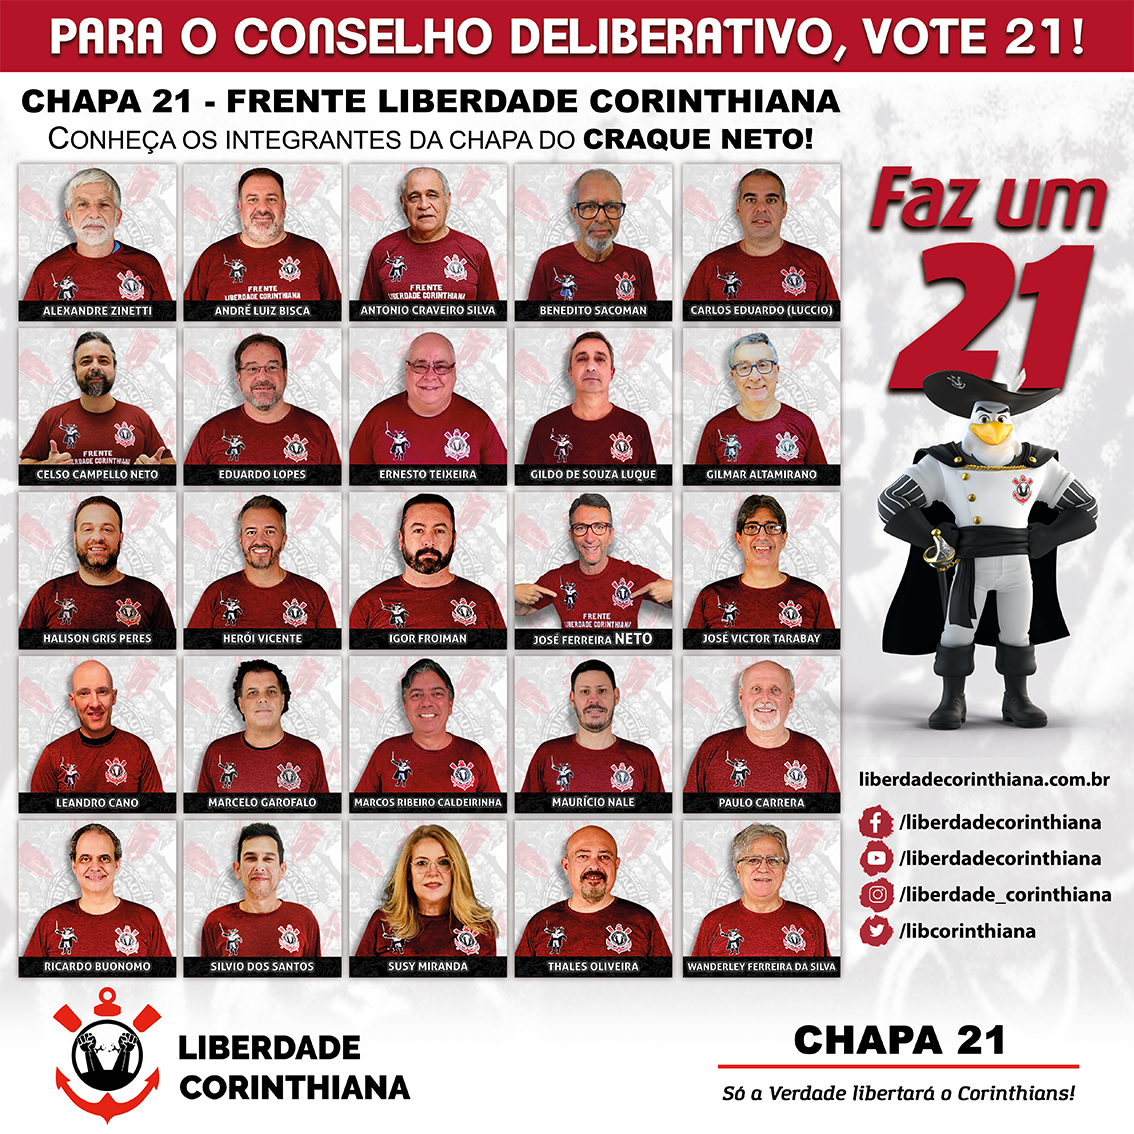 INTEGRANTES DA CHAPA 21 - FRENTE LIBERDADE CORINTHIANA